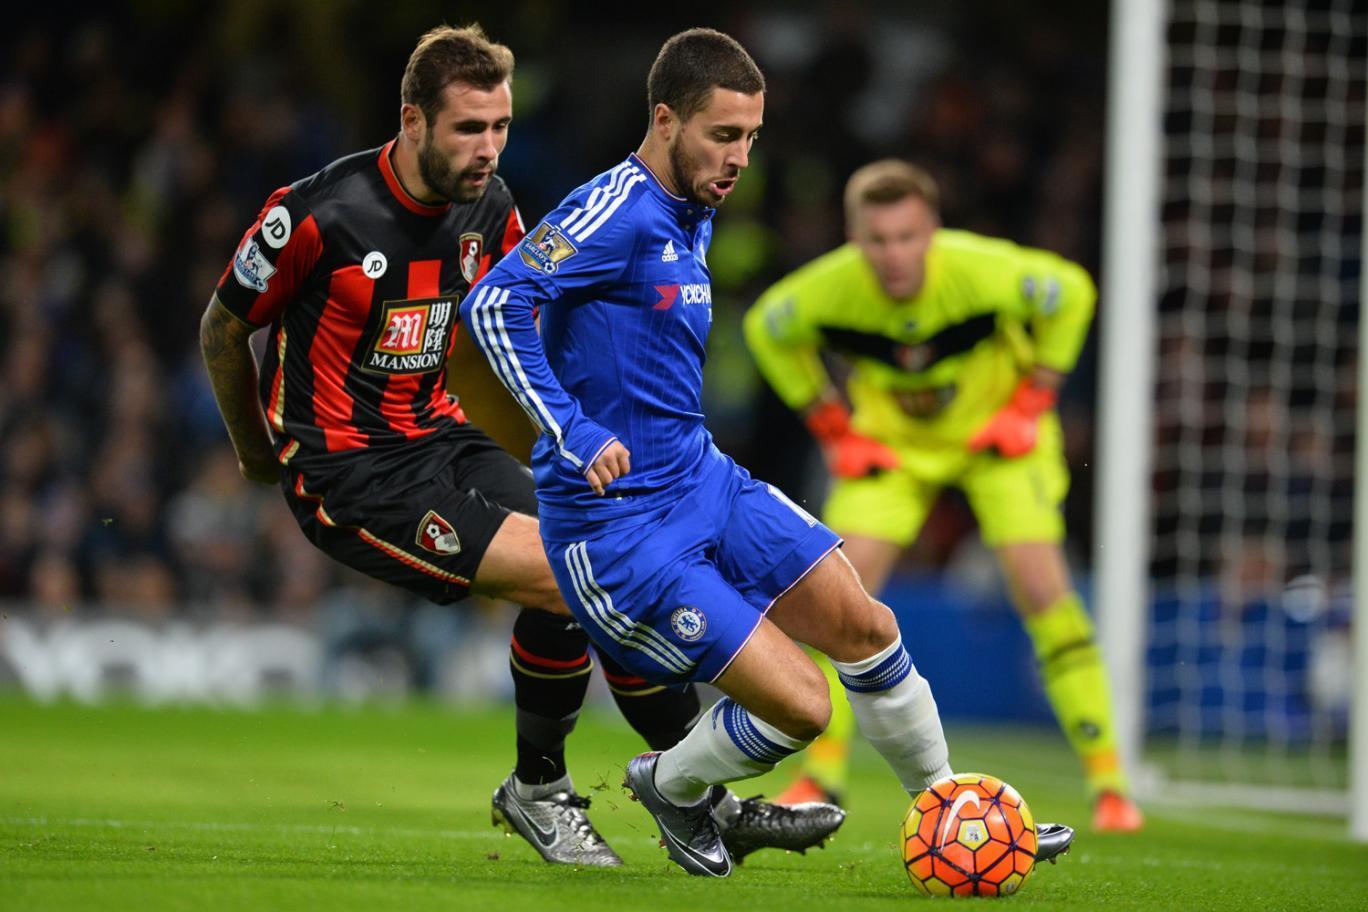 Premier League Game Week 15 Soccer Review | Movie TV Tech Geeks News